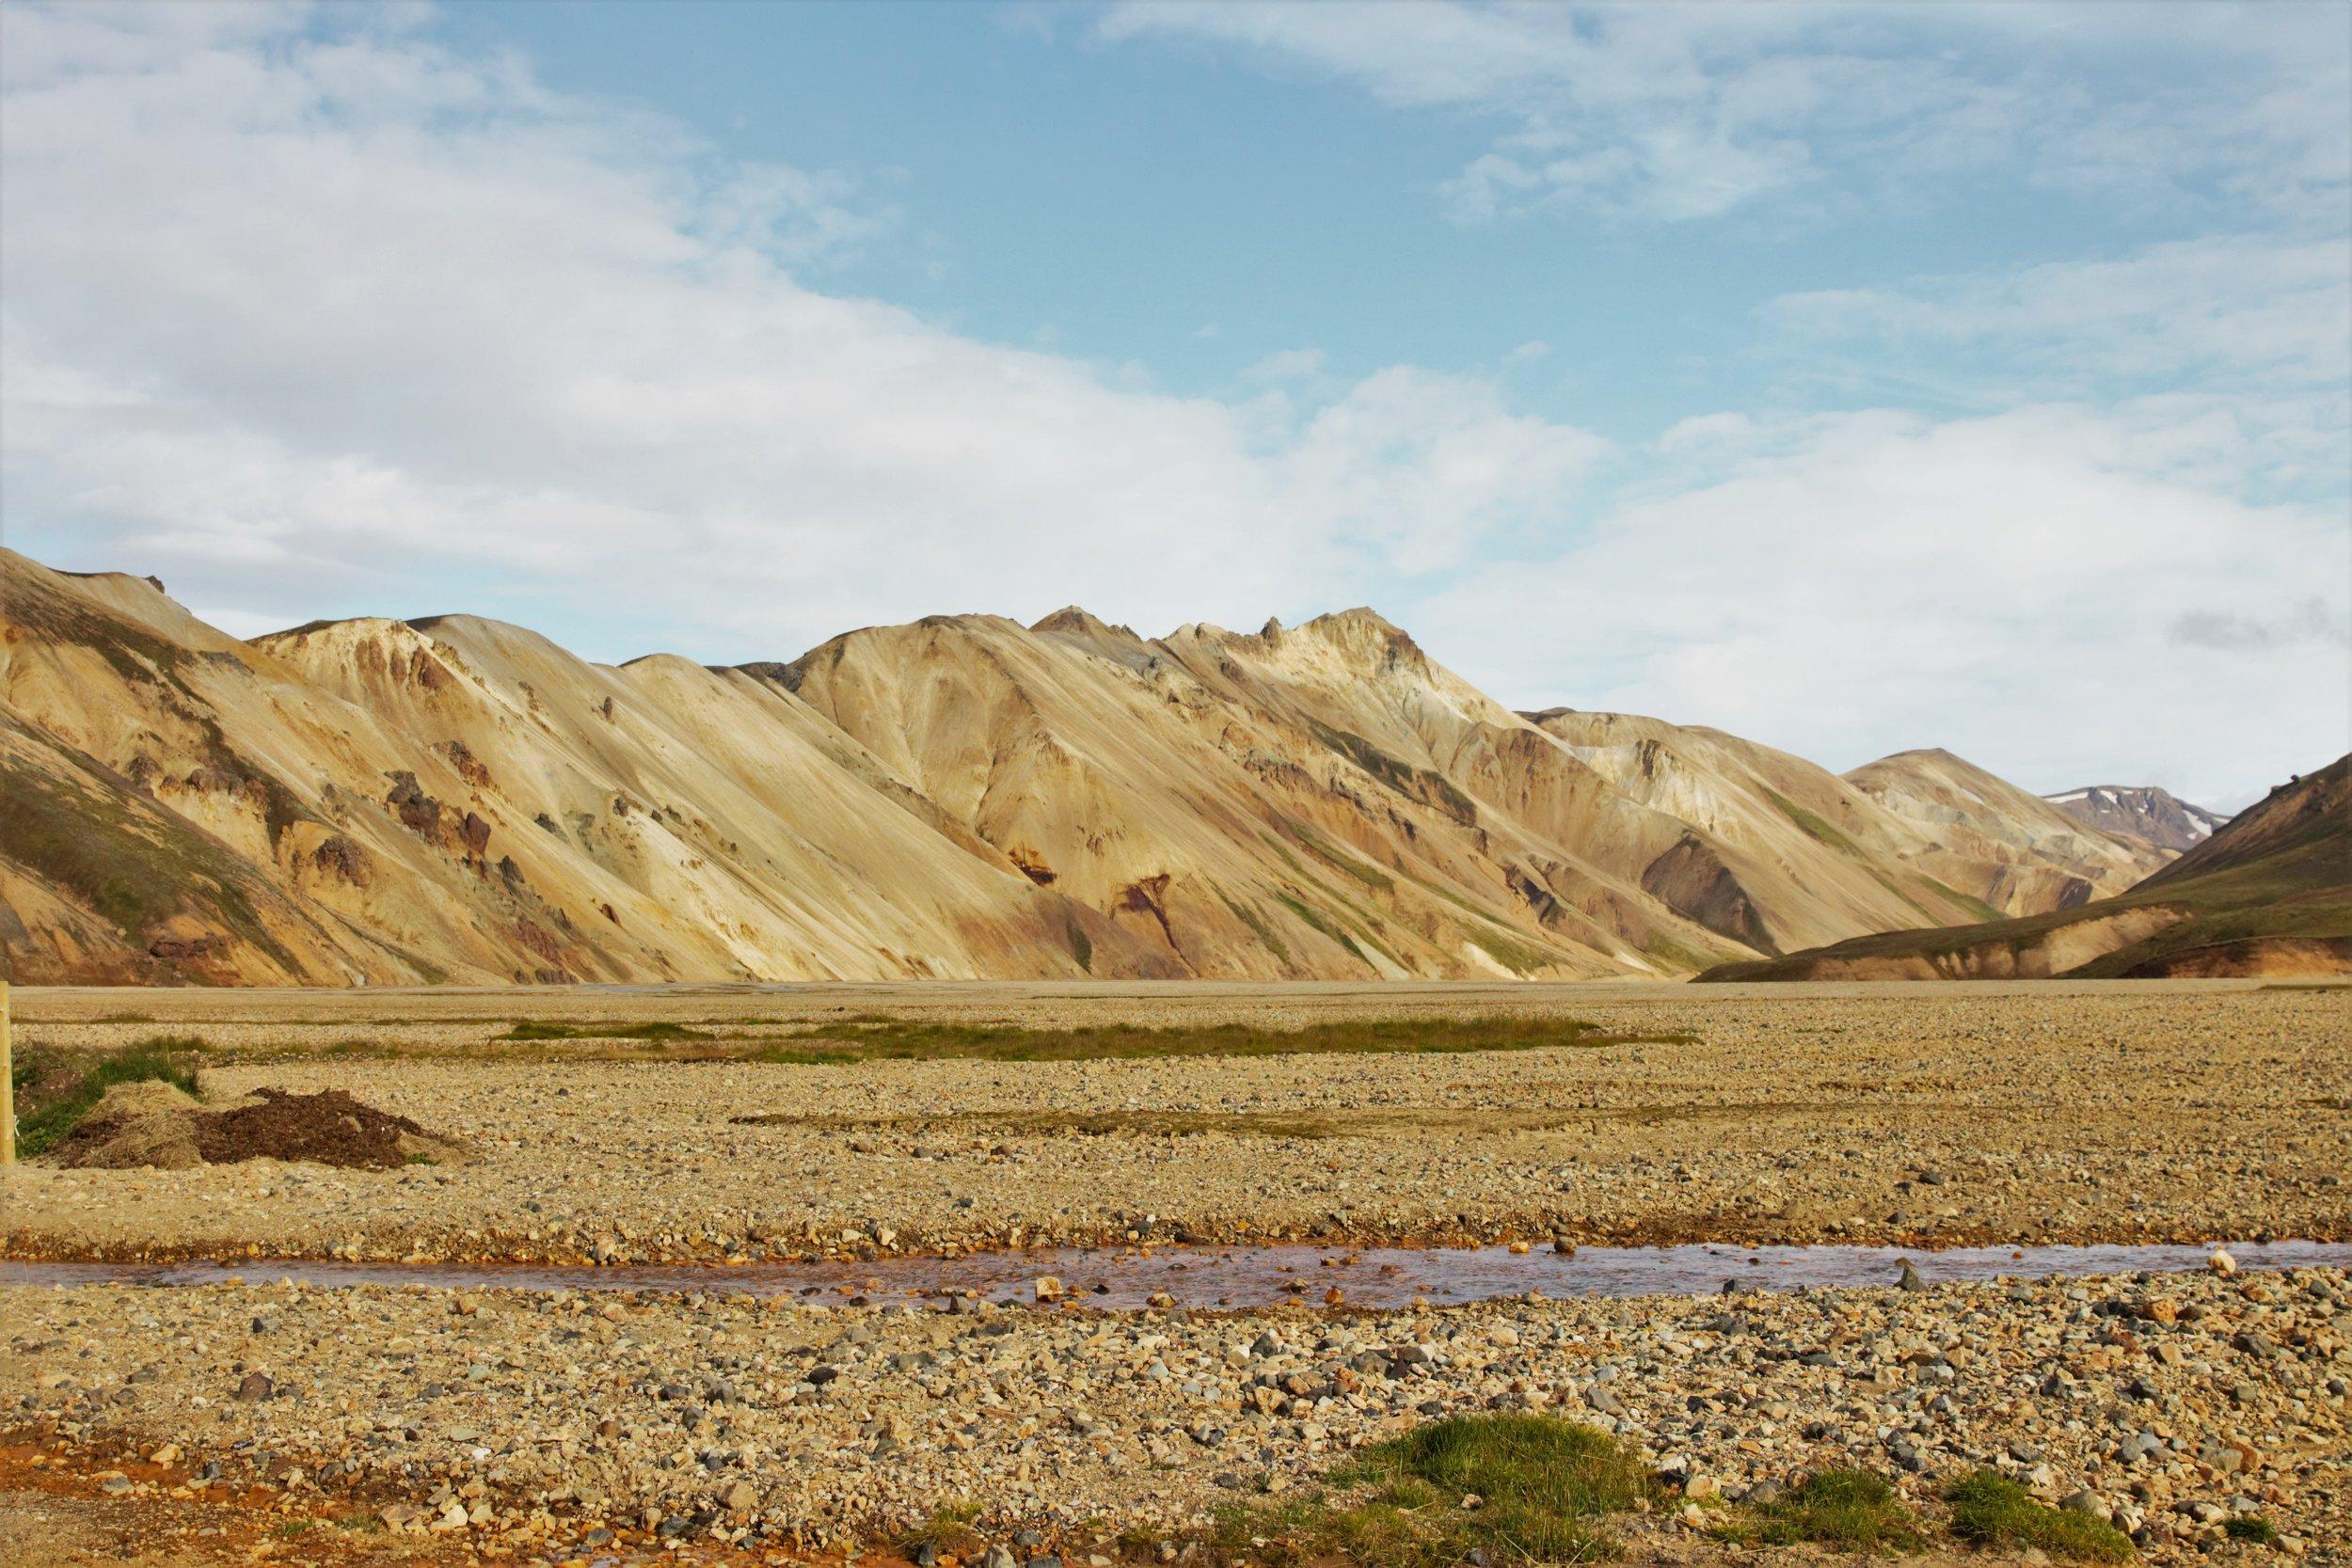 The mountains of Landmannalaugar.